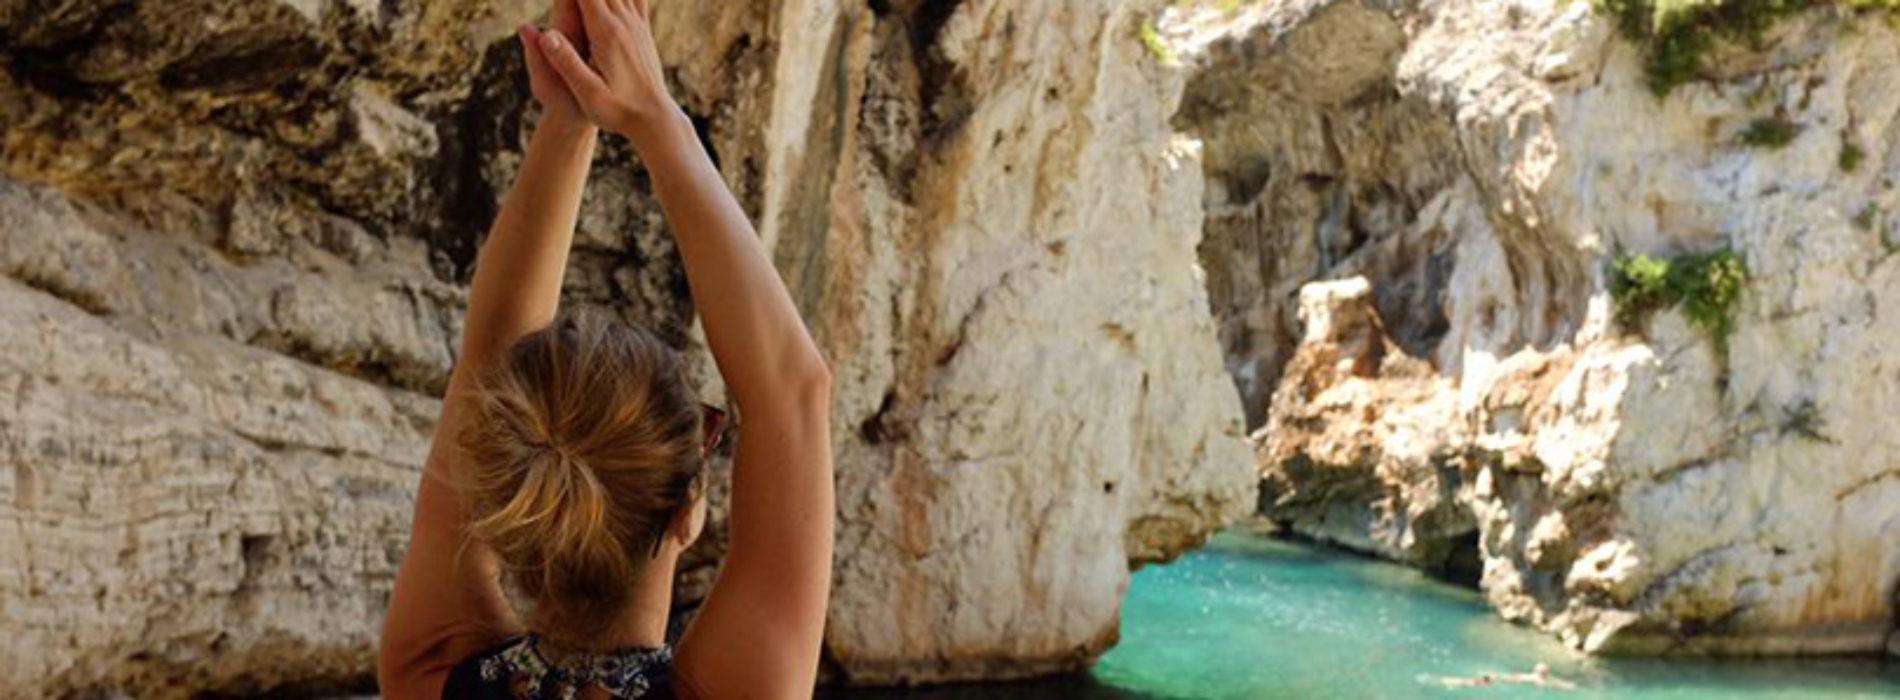 Island hopping en Croatie : bonne bouffe, yoga et détente